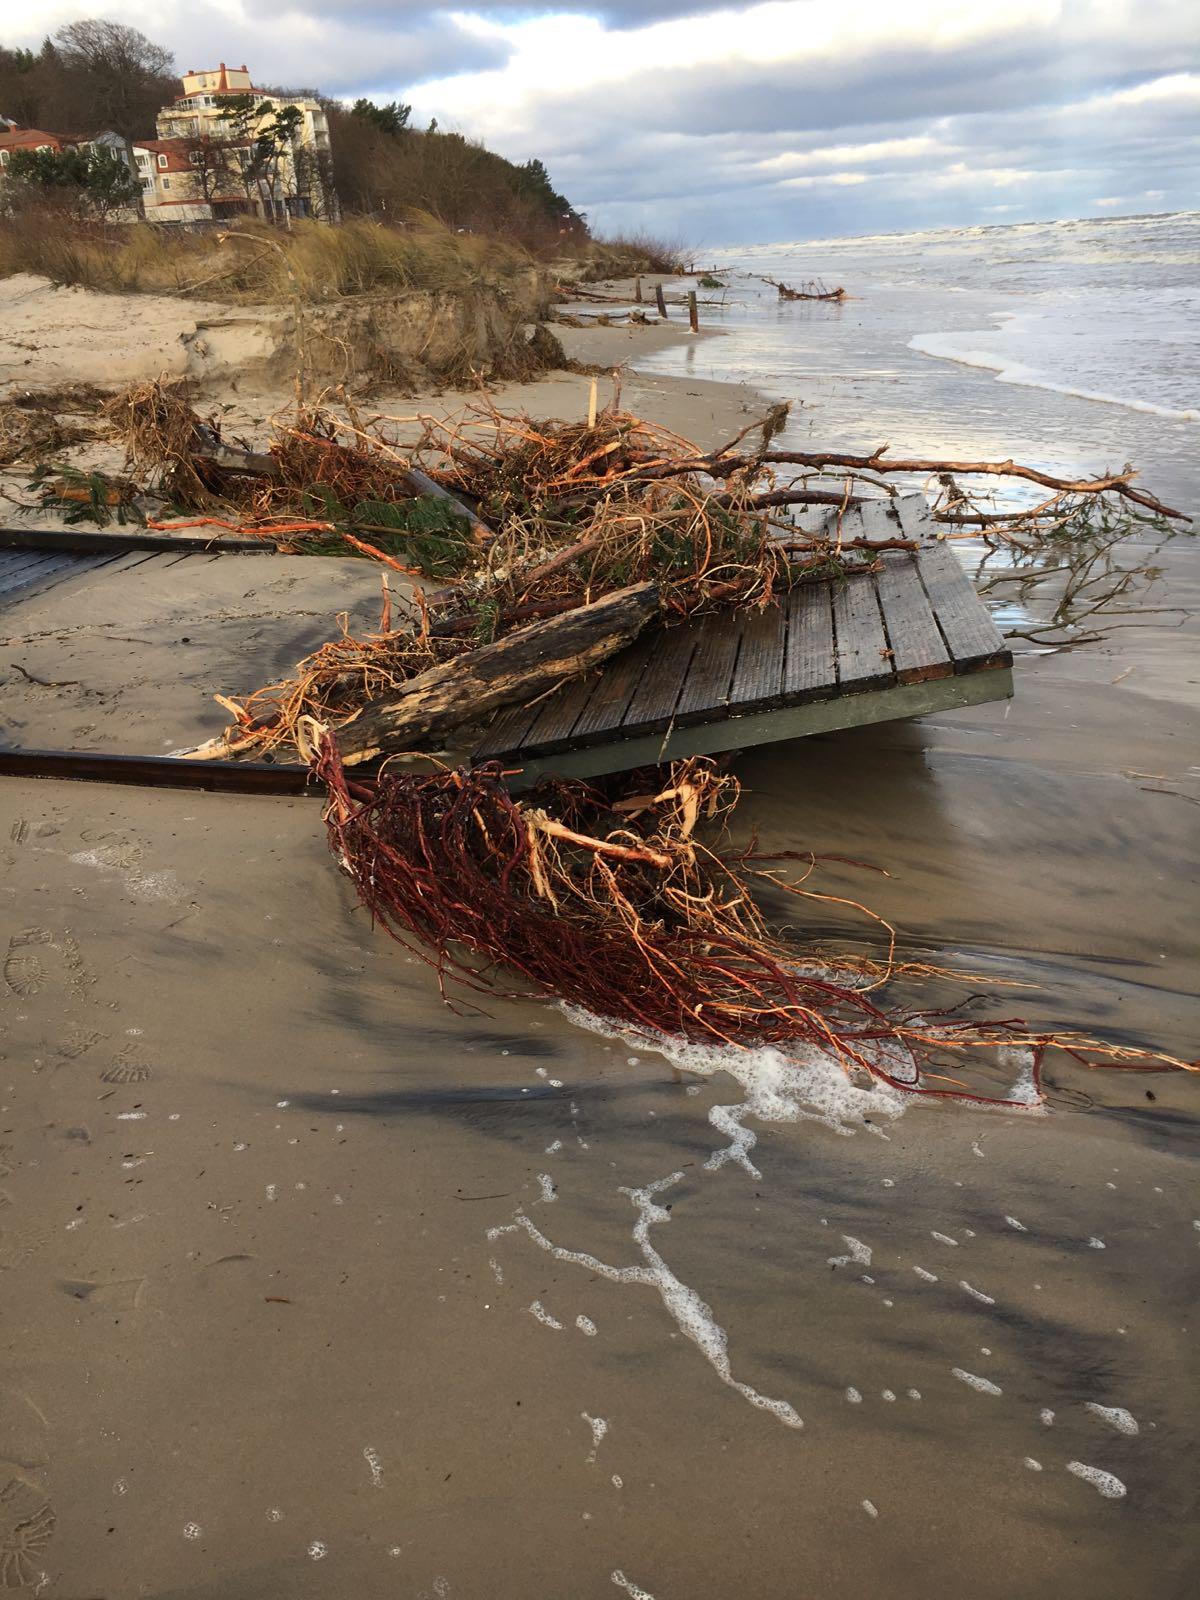 Strandaufgang Insel Usedom Ahlbeck Heringsdorf Bansin Sturmtief Axel Hochwasser Sturmflut Unterspülung